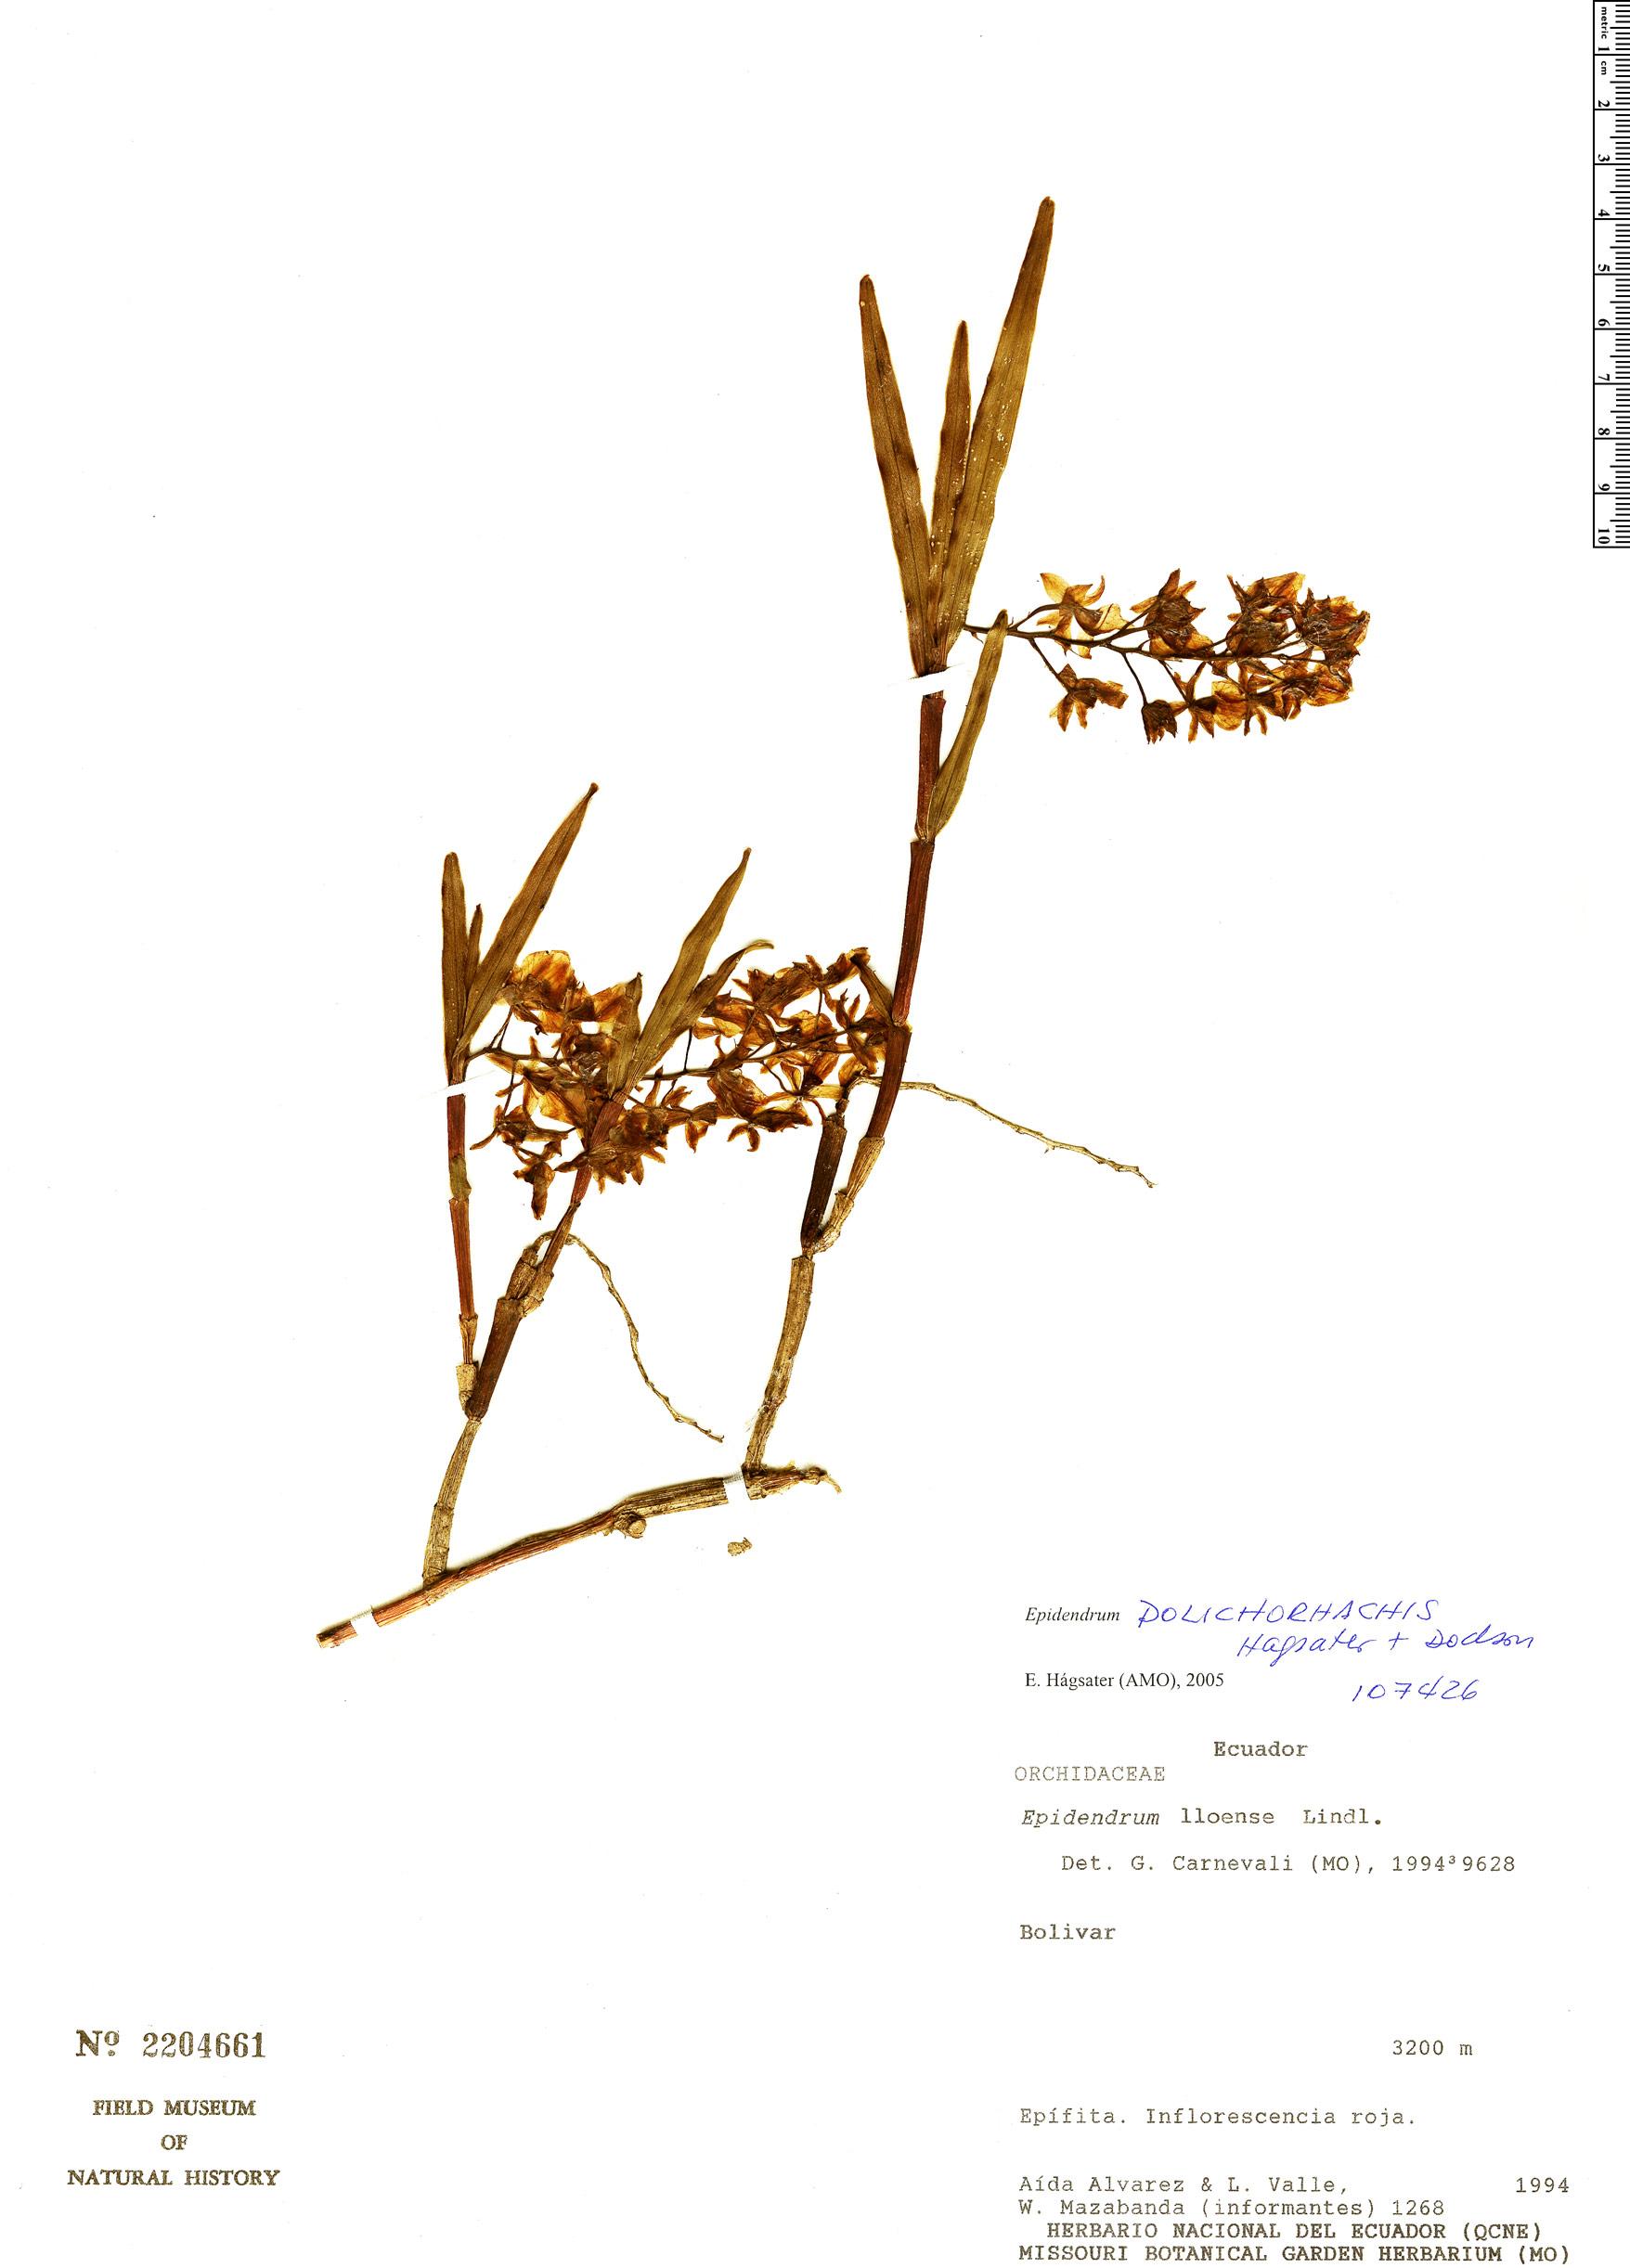 Specimen: Epidendrum dolichorhachis